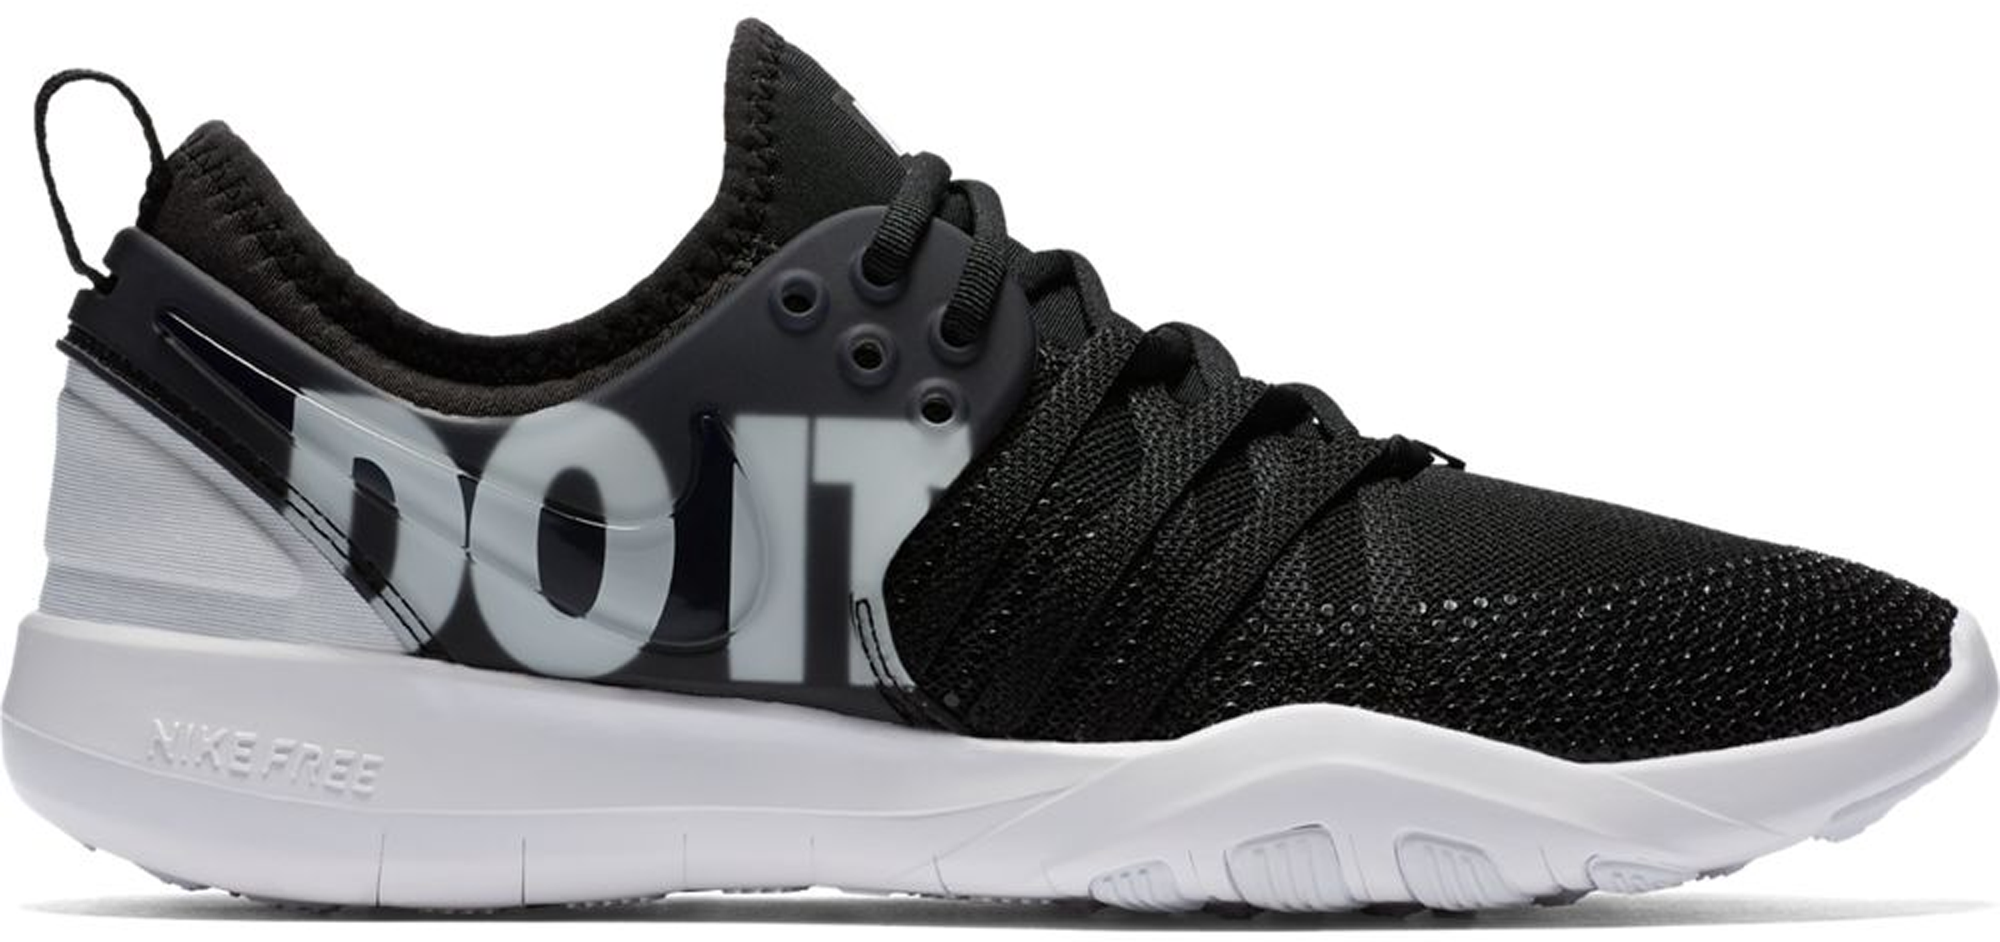 Nike Free Tr 7 Premium Just Do It Black